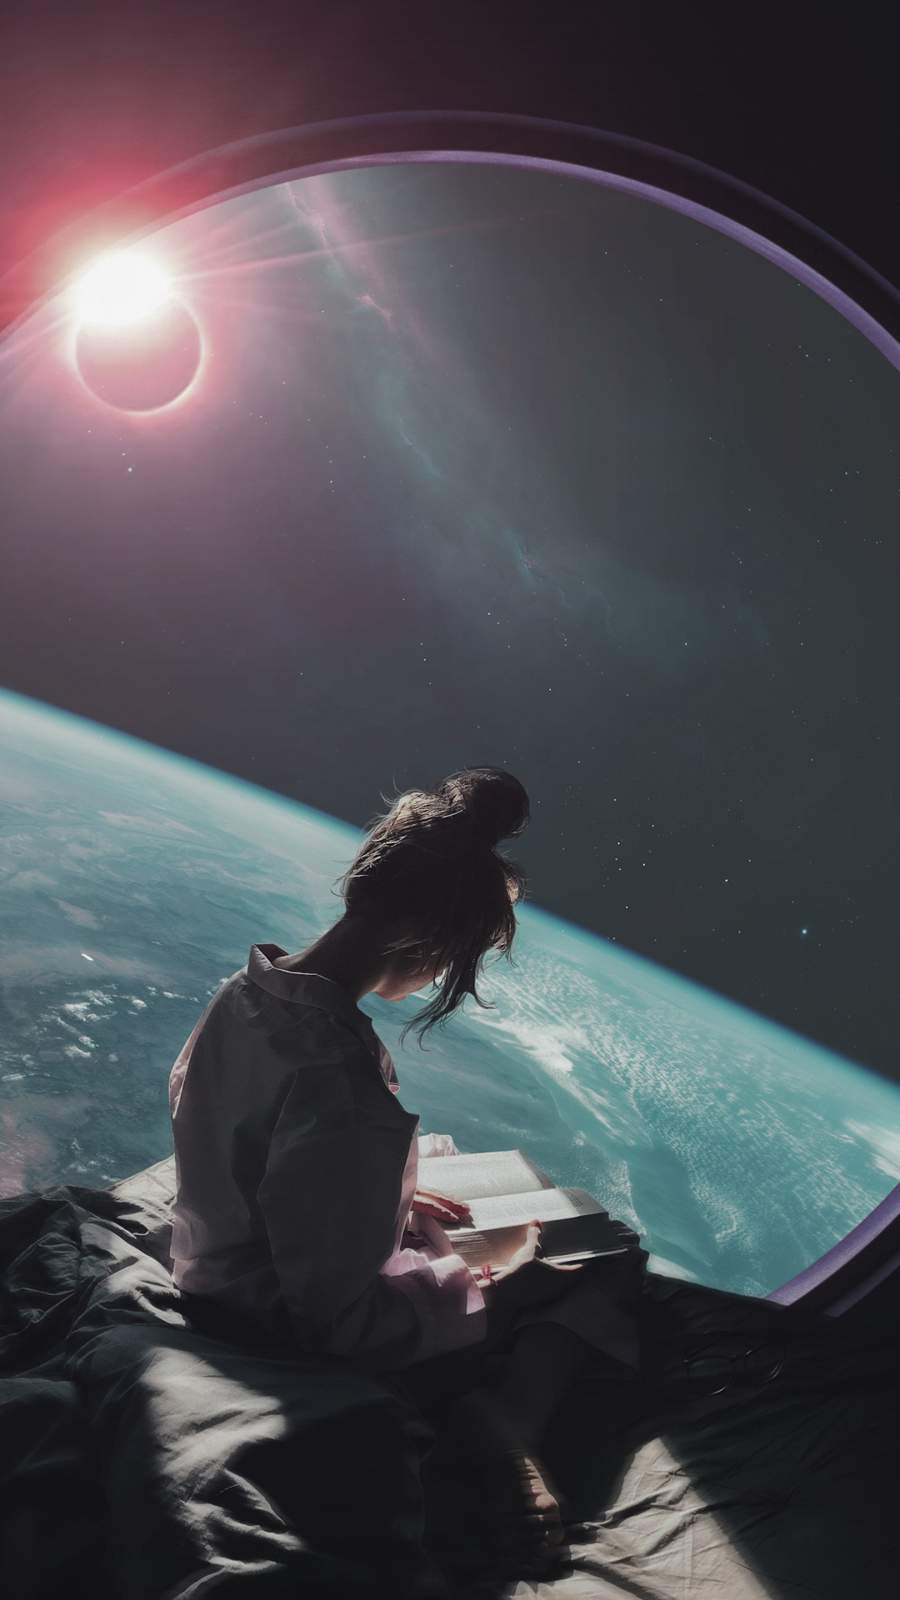 Space Dreams iPhone Wallpaper